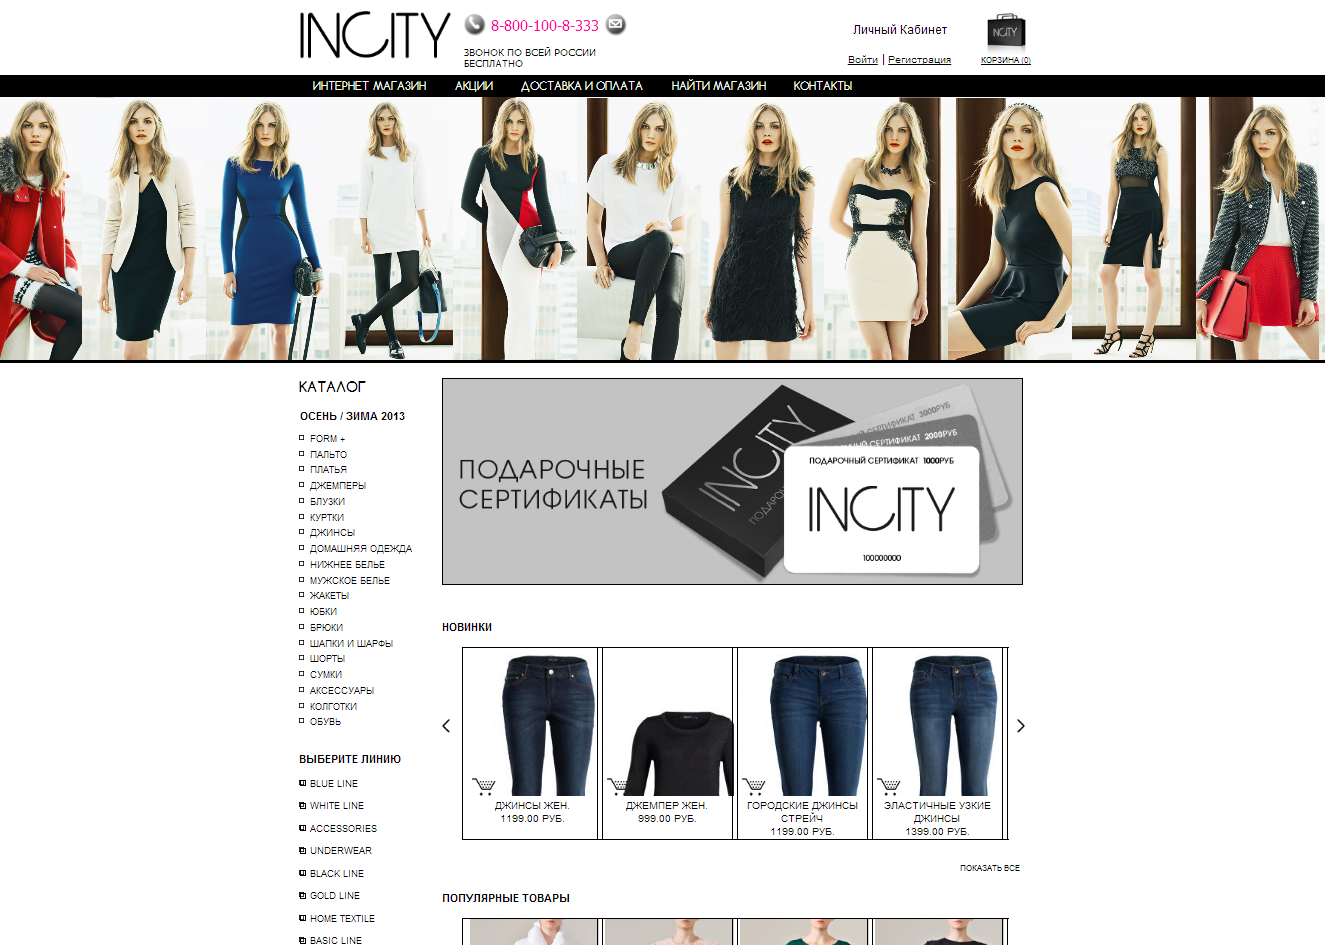 Магазин Инсити Каталог Одежды